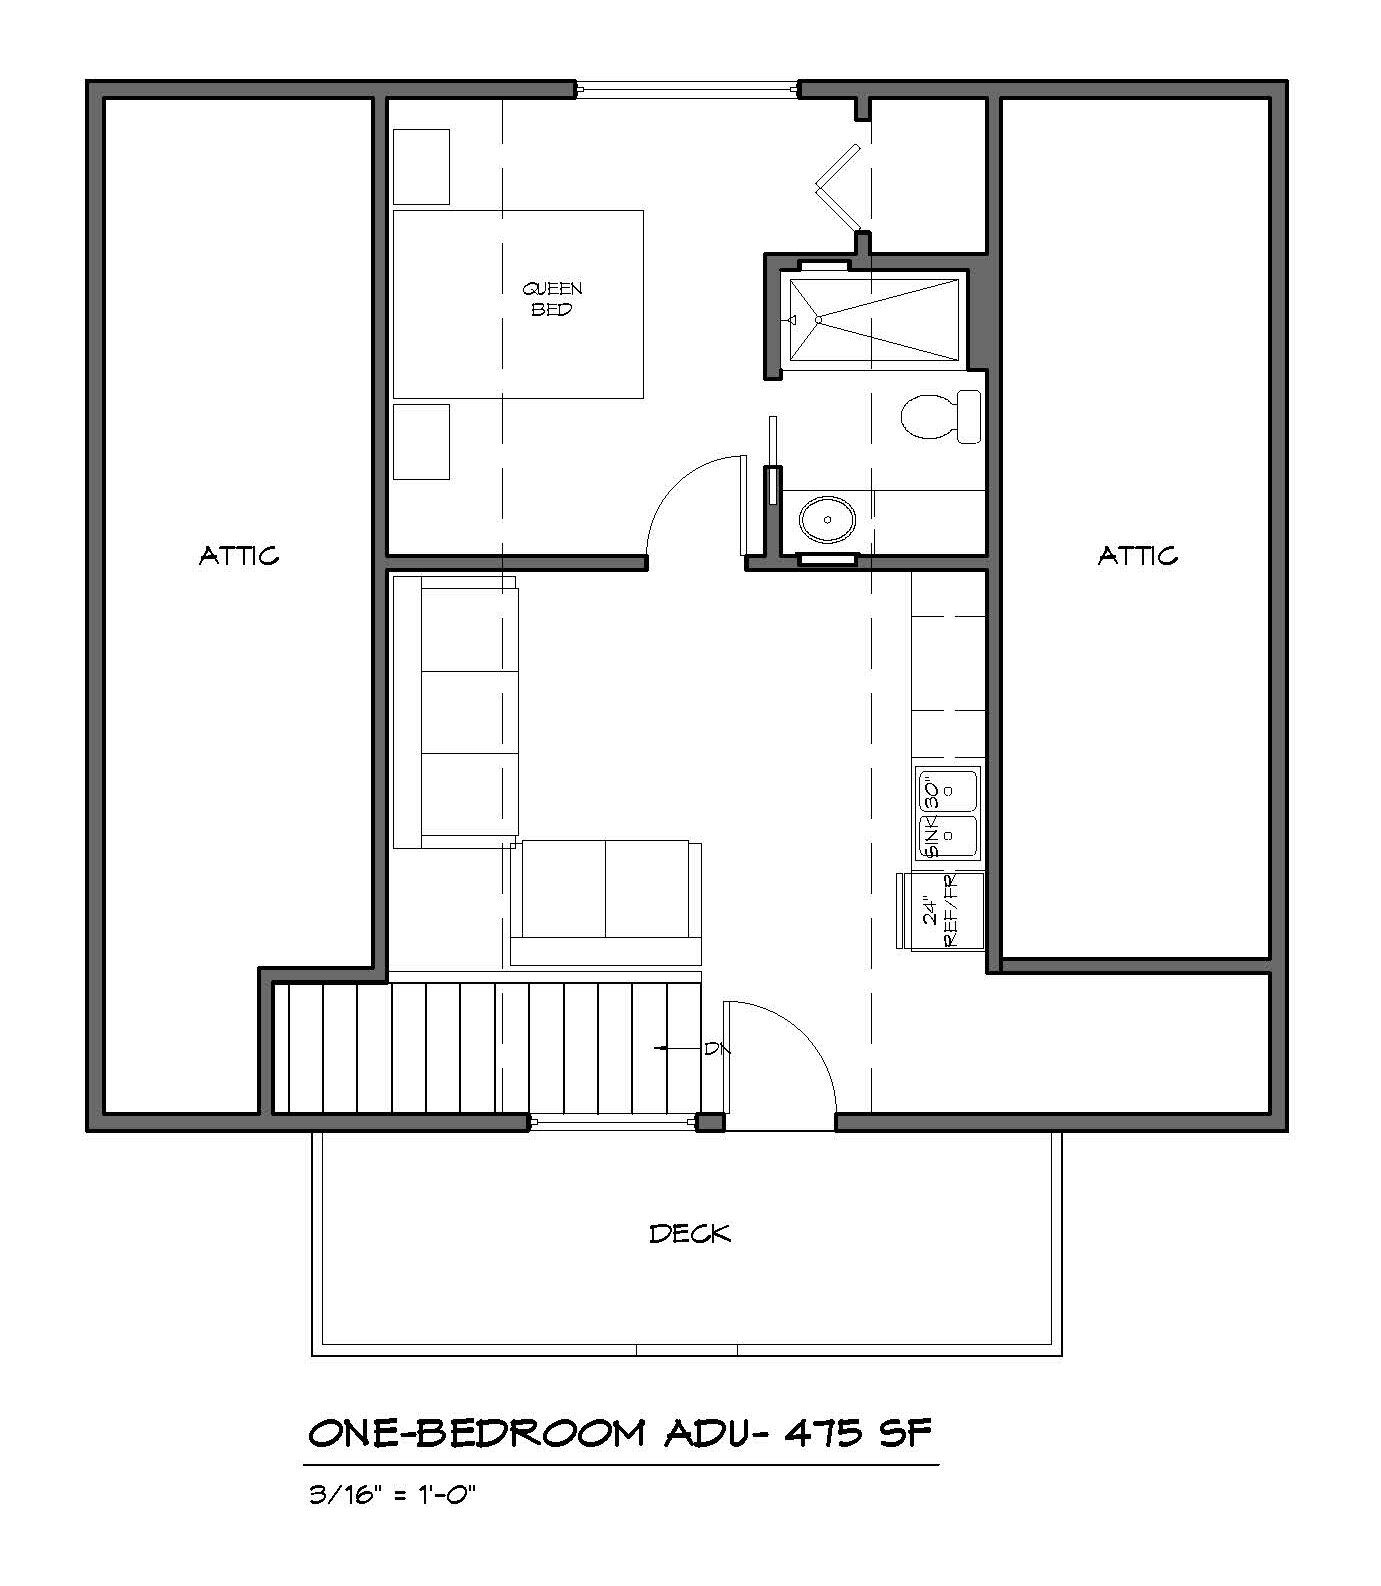 Building an ADU — Meldrum Design